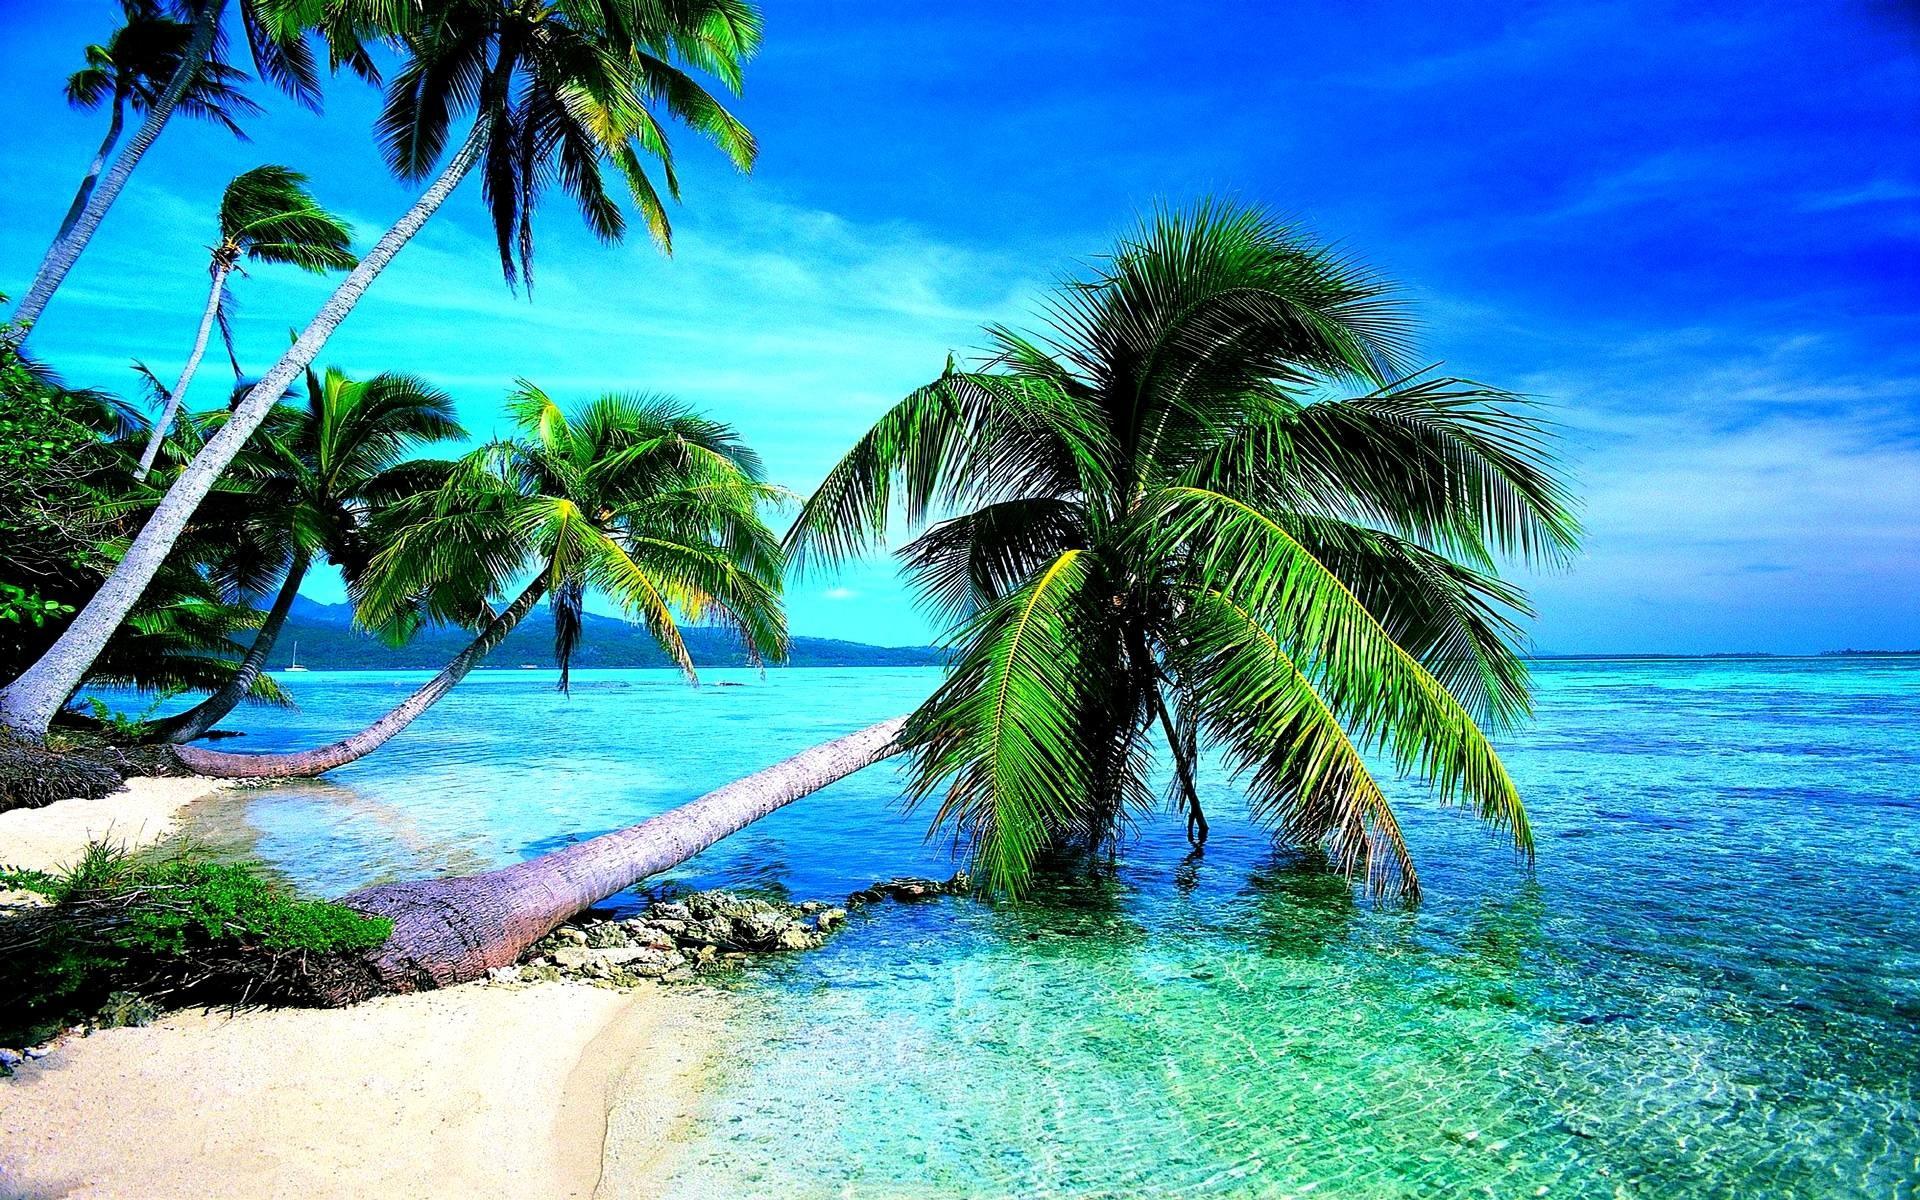 Tropical Beach Wallpapers Desktop – Wallpaper Cave